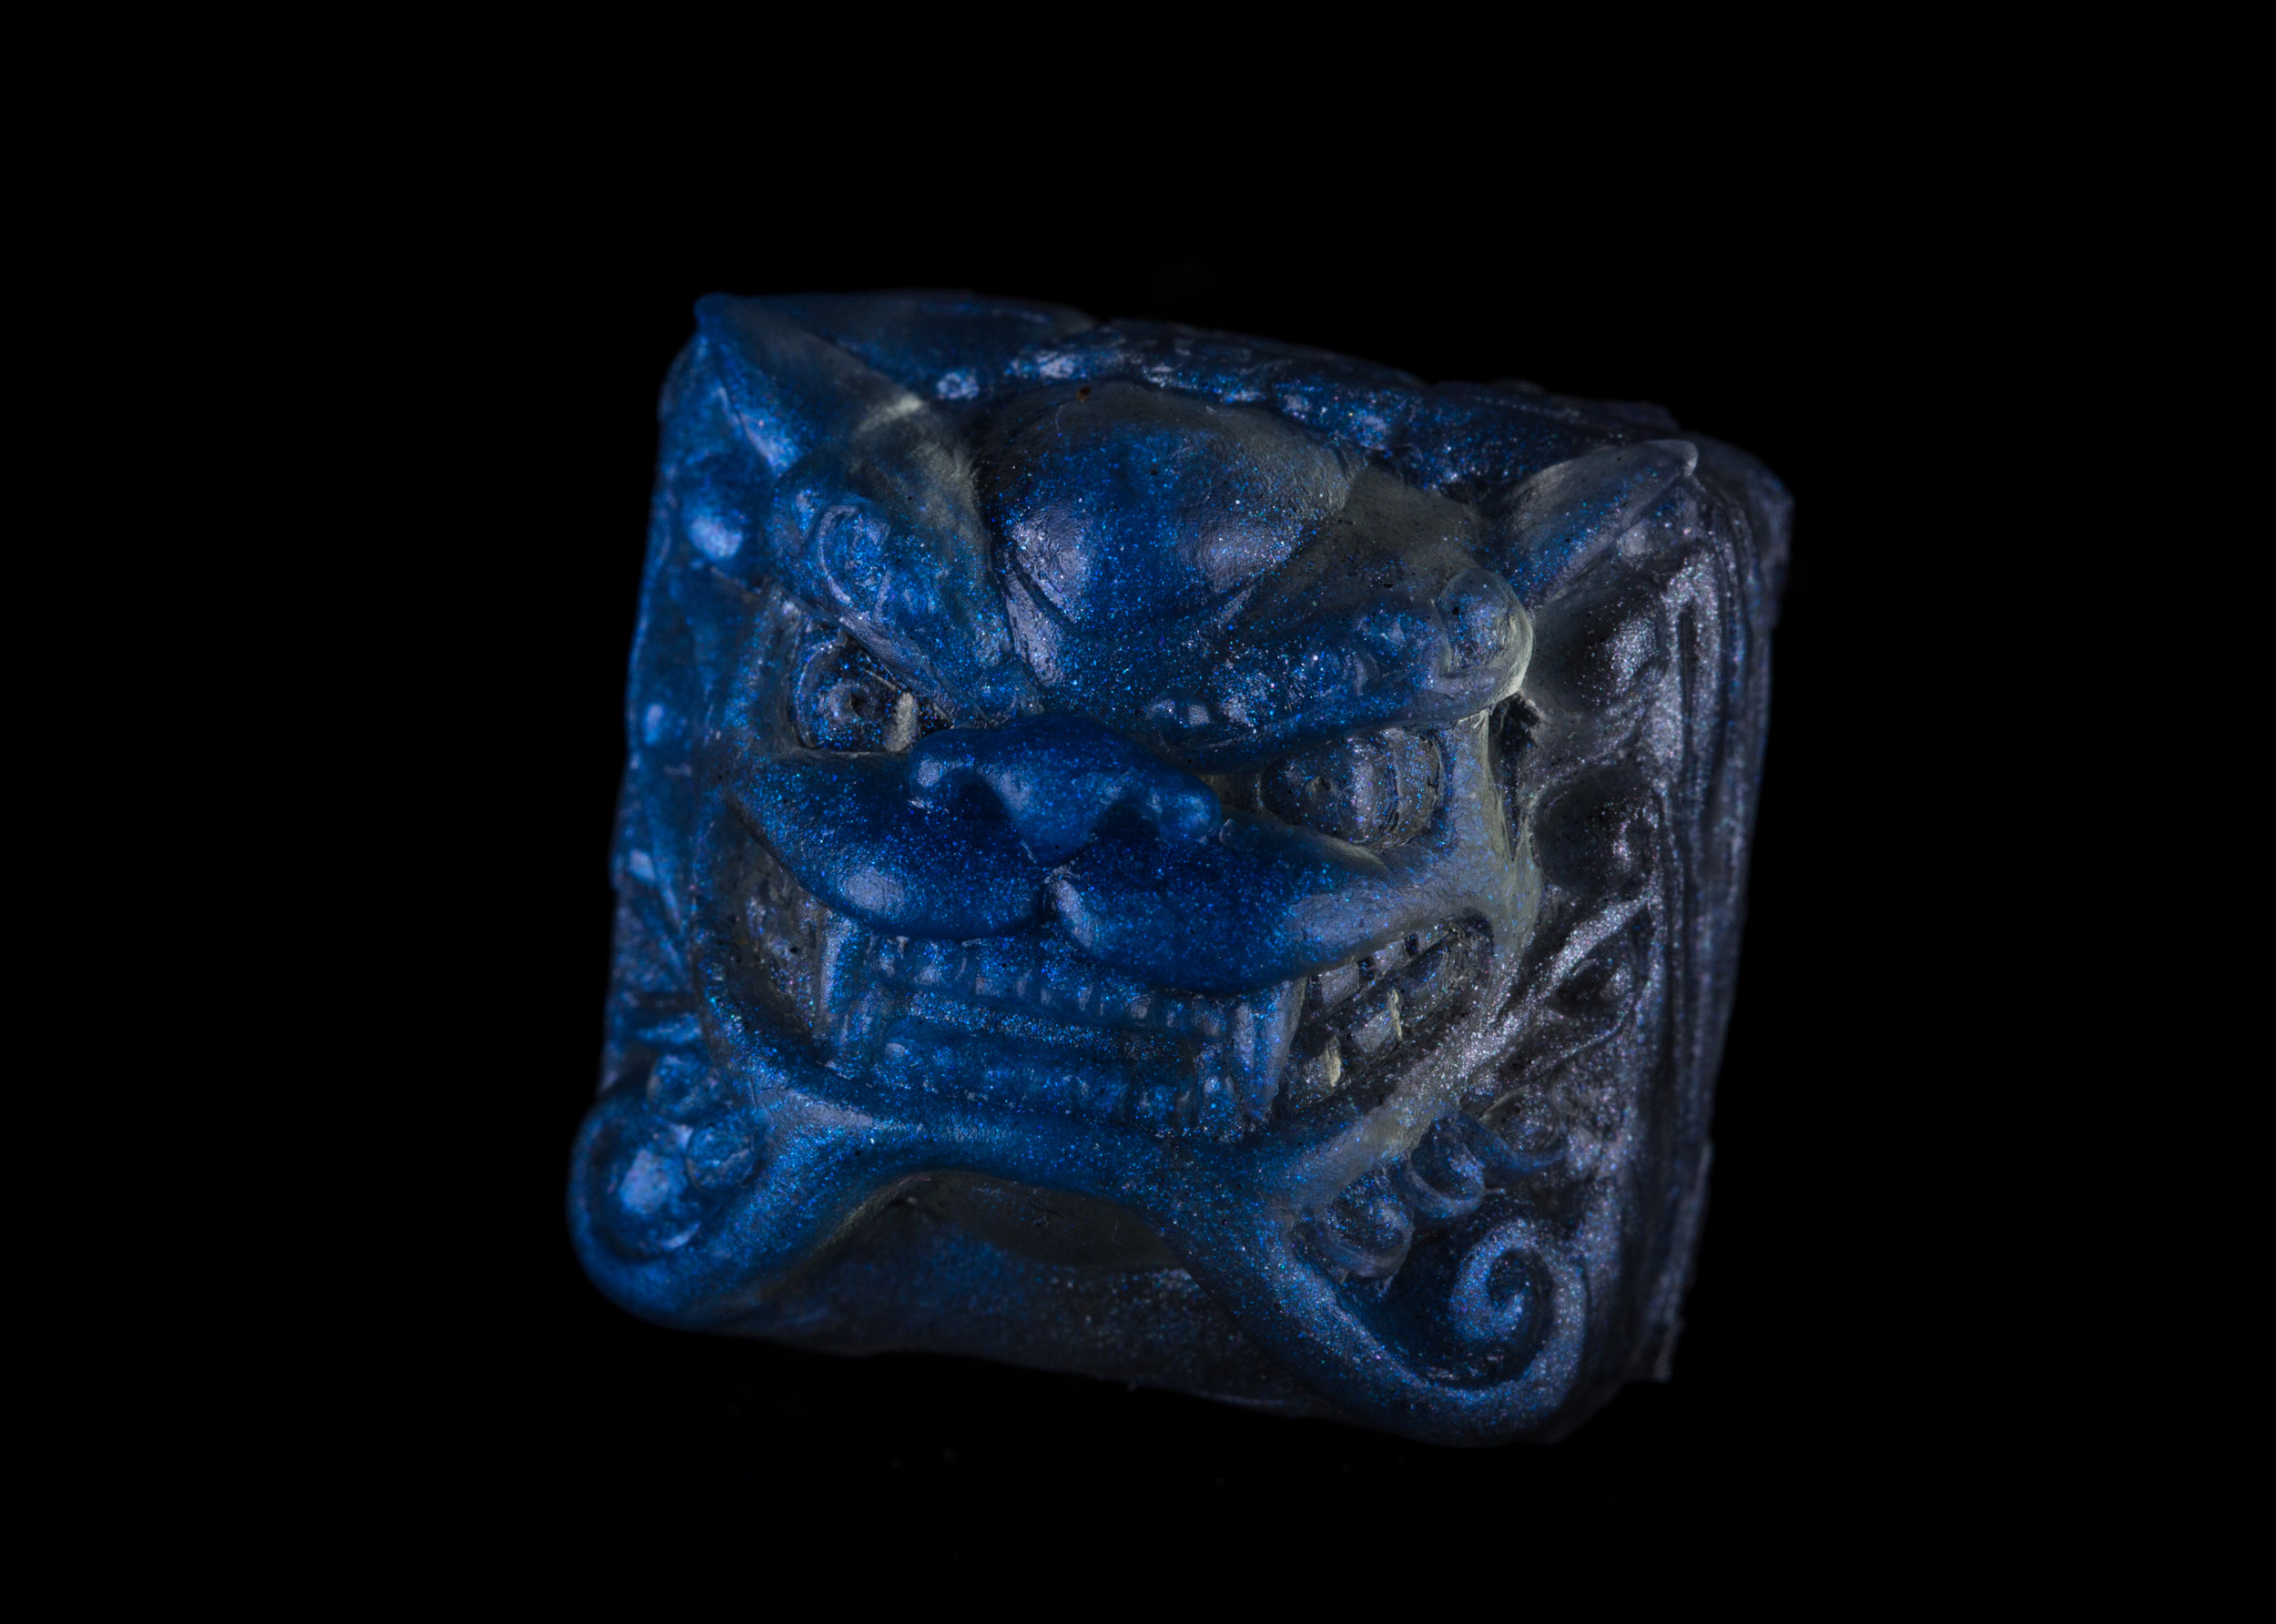 Frostbite - $70